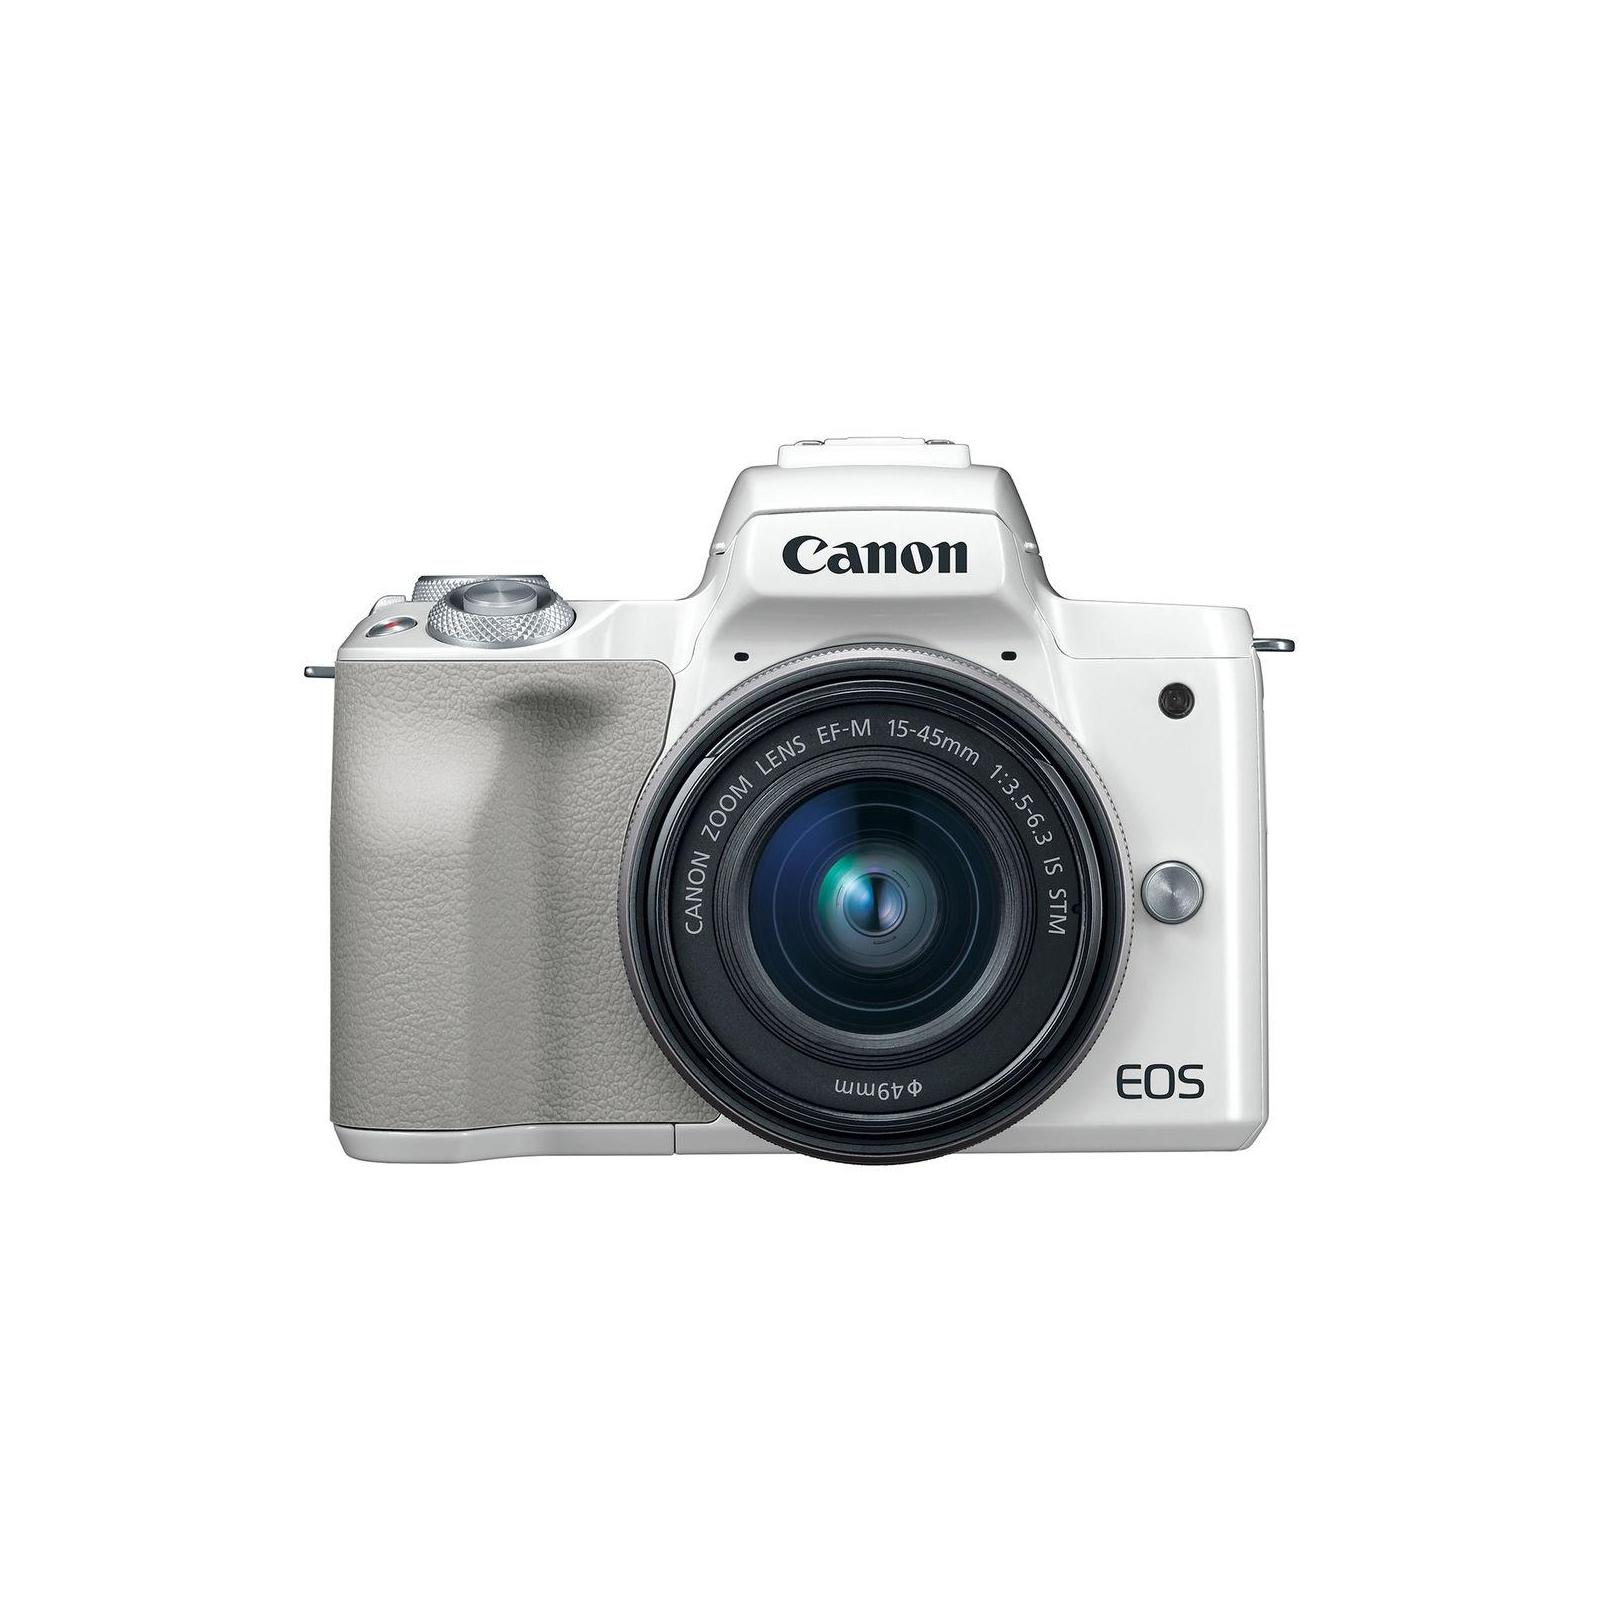 Цифровой фотоаппарат Canon EOS M50 15-45 IS STM Kit White (2681C057) изображение 2